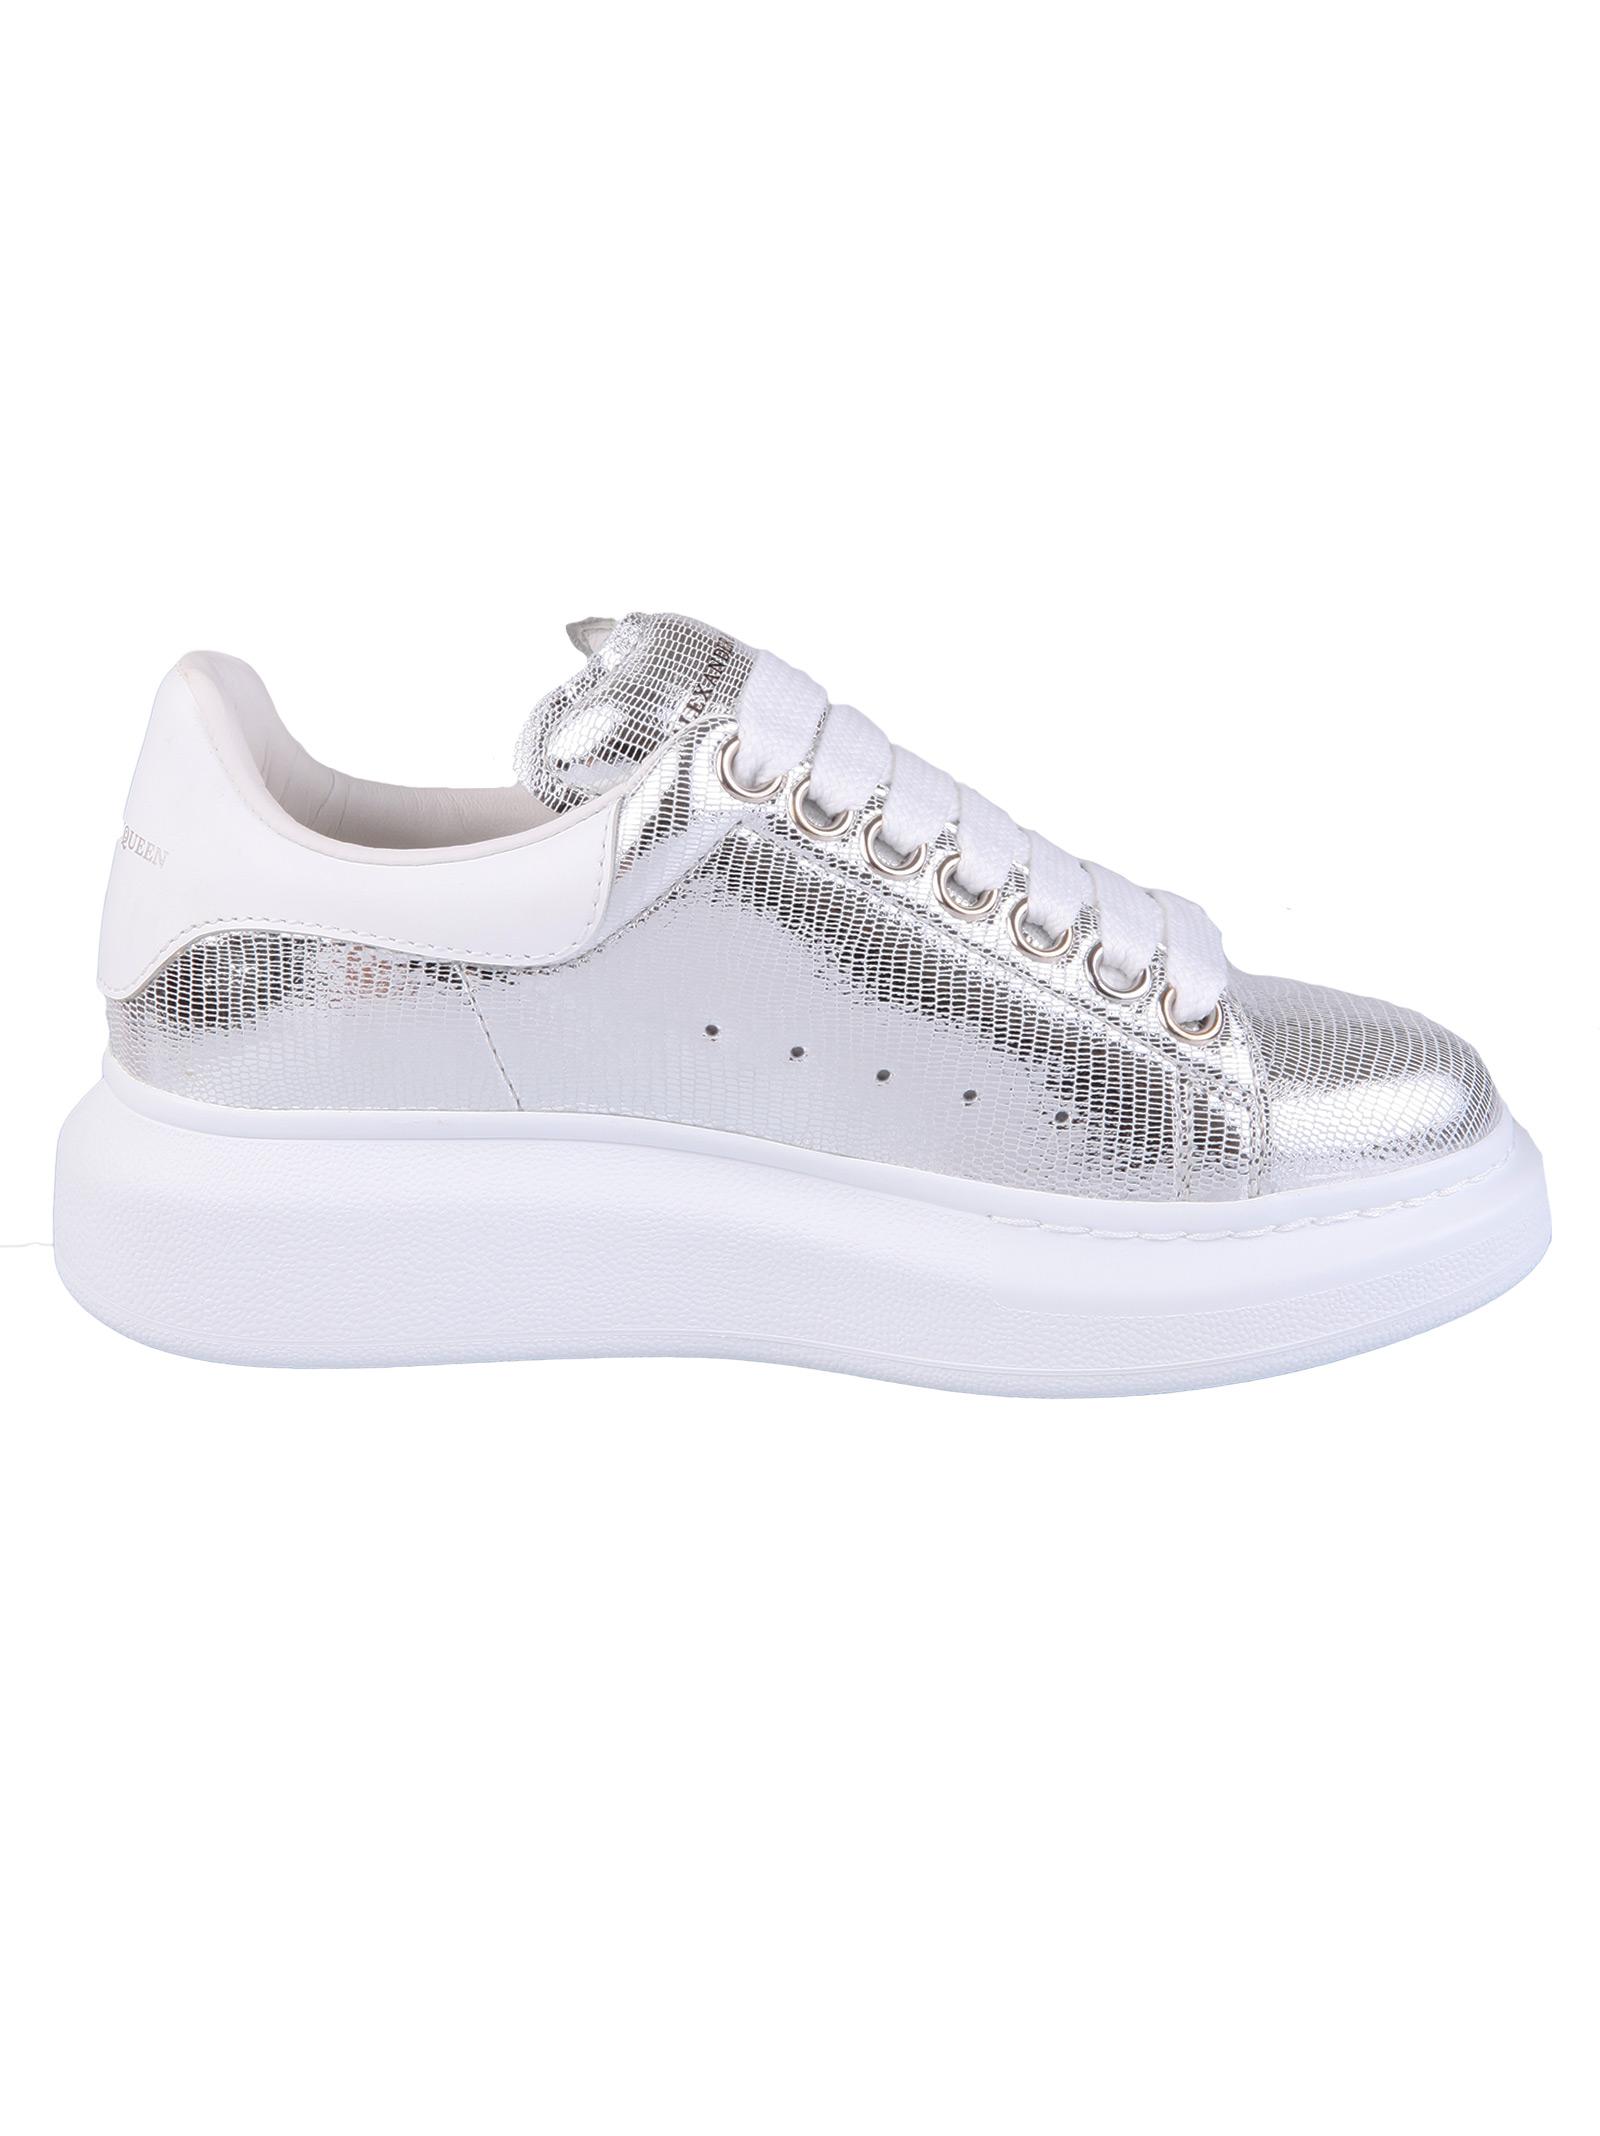 002f1bbbcdbd8 Alexander McQueen sneakers - Alexander McQueen - Michele Franzese Moda